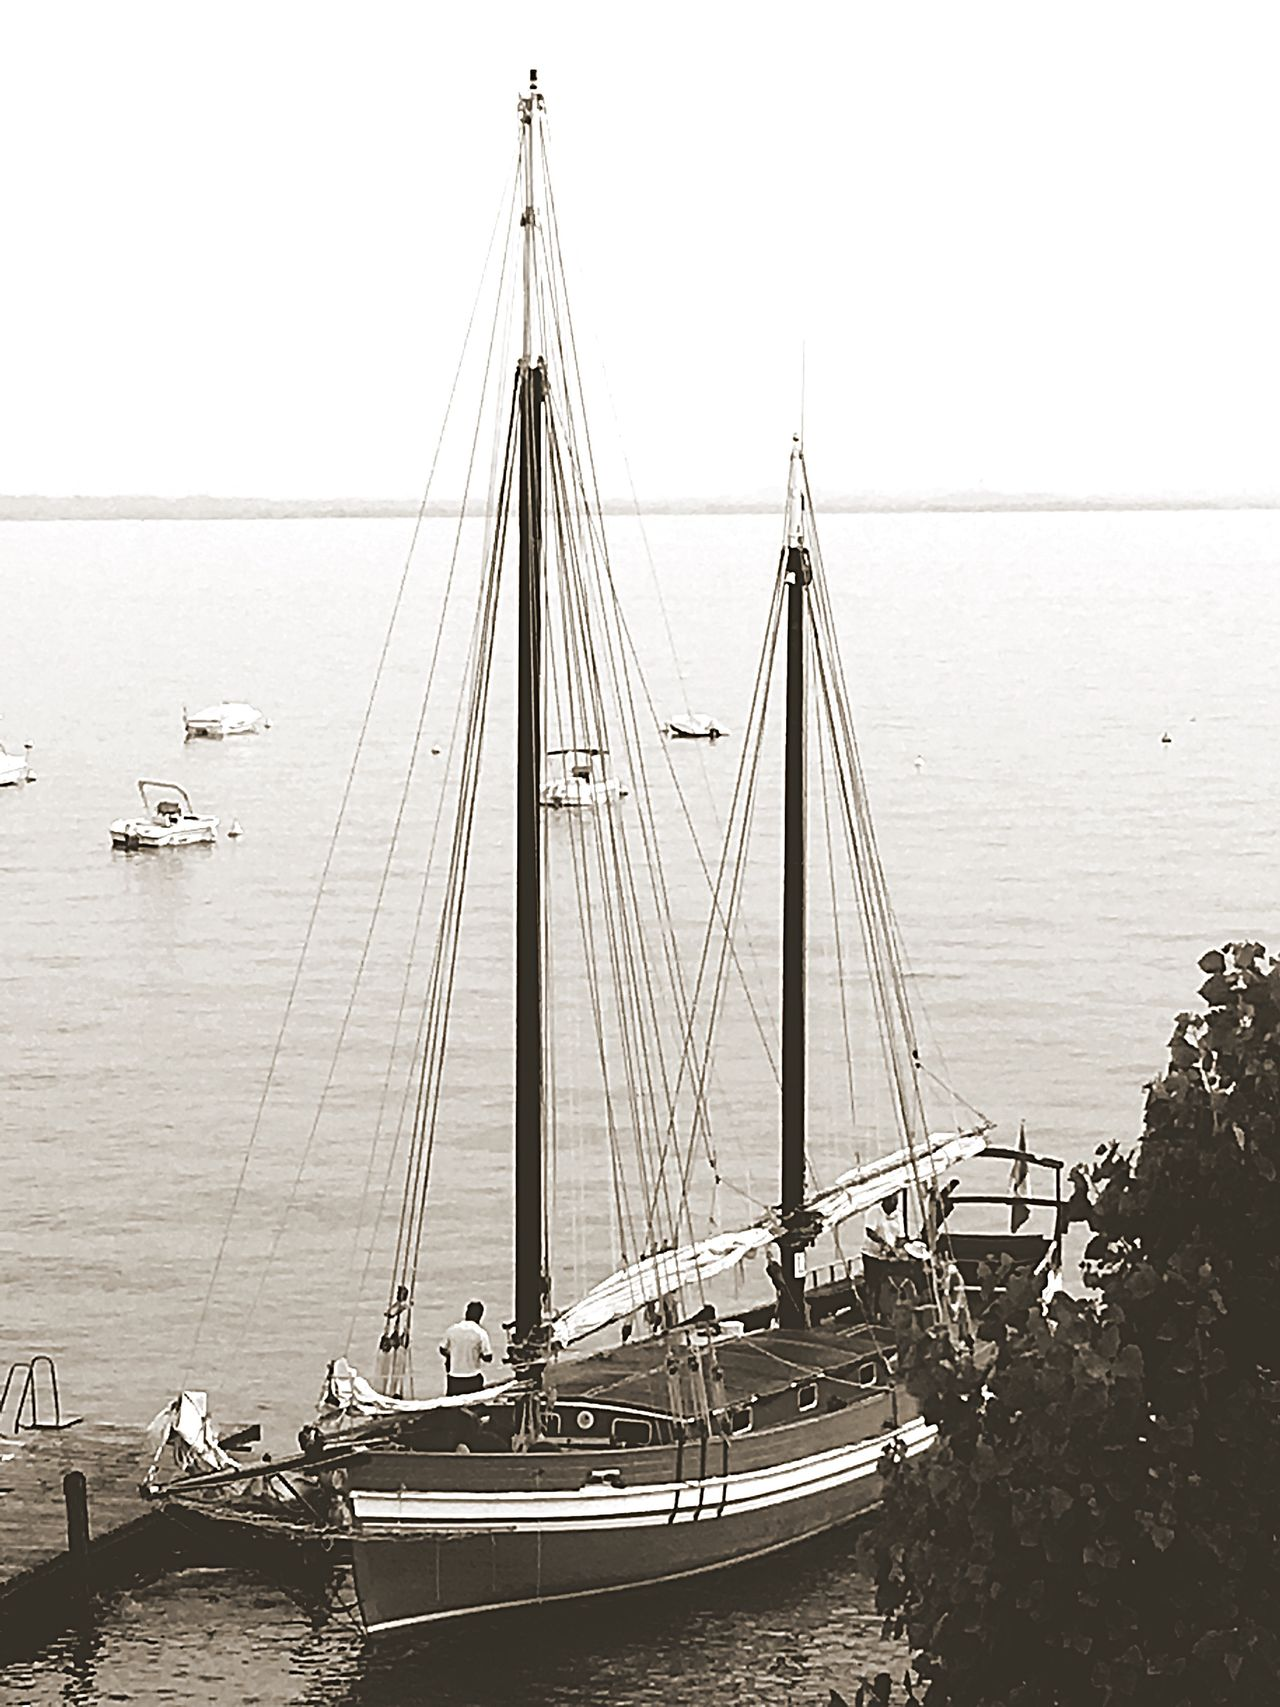 Italy🇮🇹 Arrivel Sea View Fine Art Photograhy Fine Art Fine Art Photography Old But Awesome Sailing Ship Sailboat Transportation Natural Beauty Sea And Sky Sailing